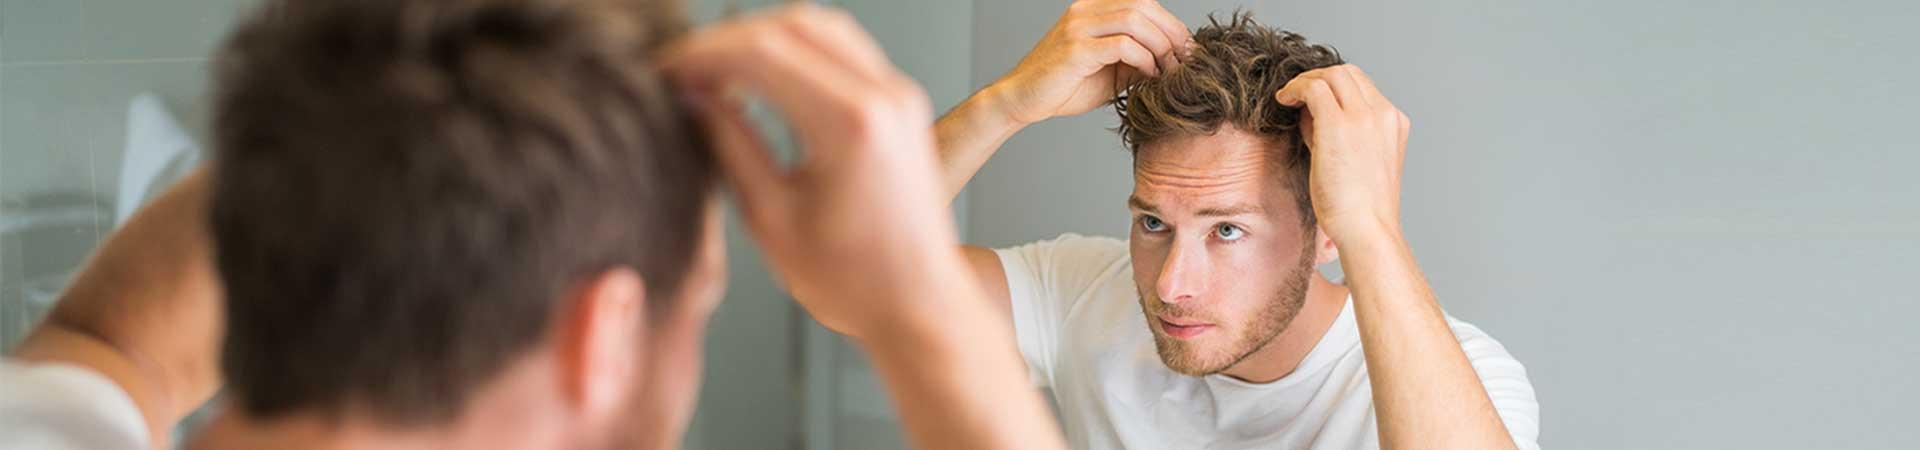 Hair Loss Treatments – General Information